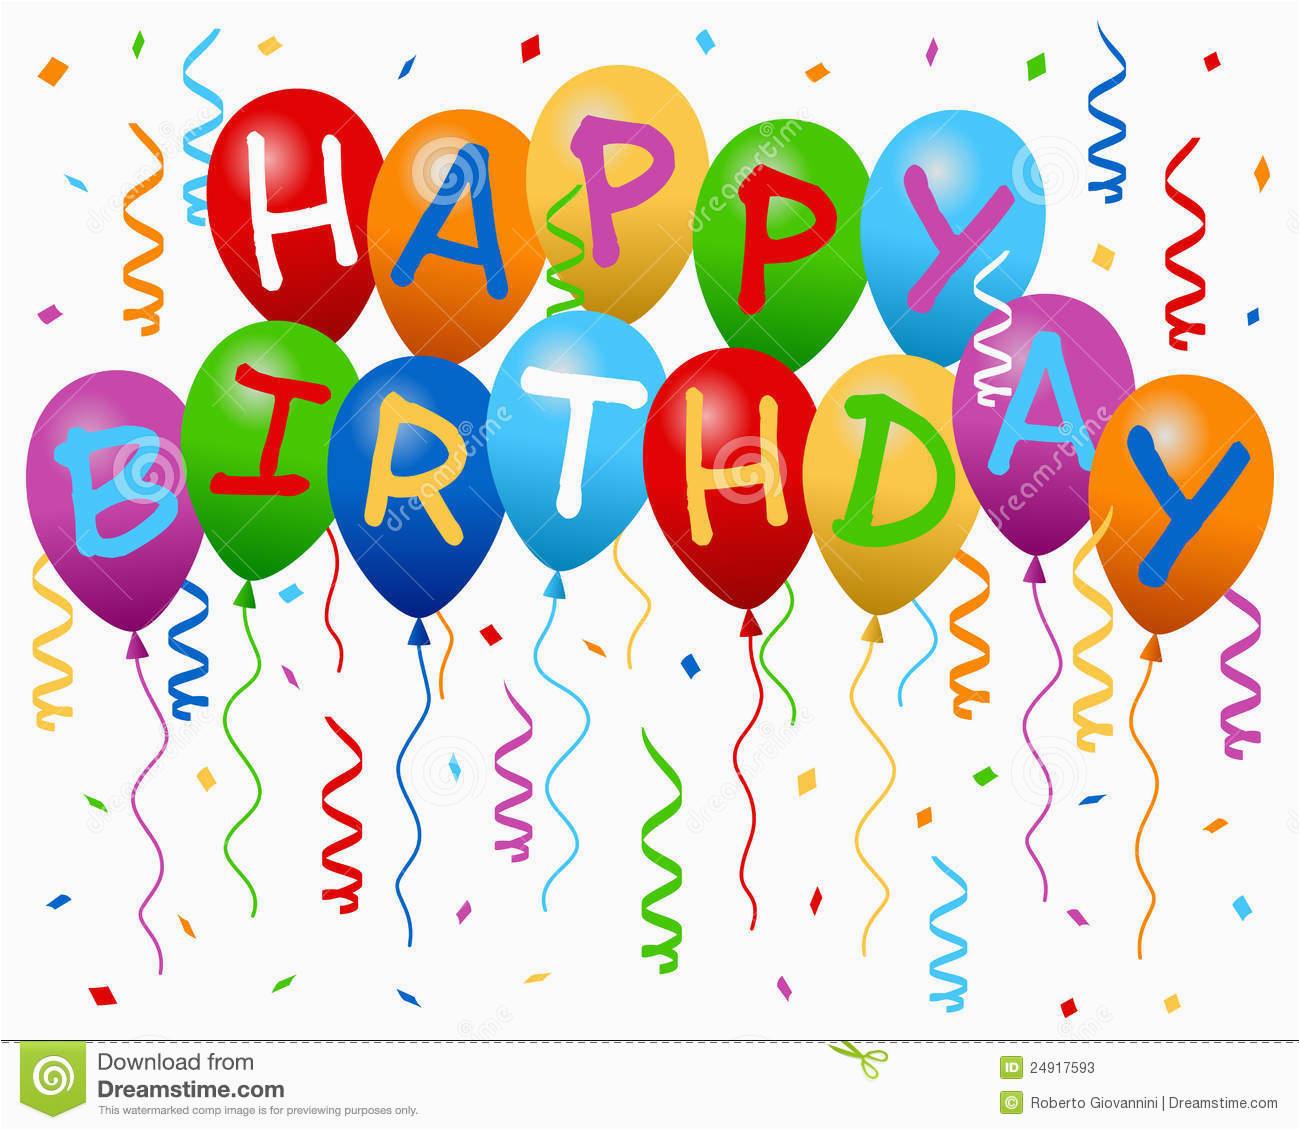 birthday wishes fee 2